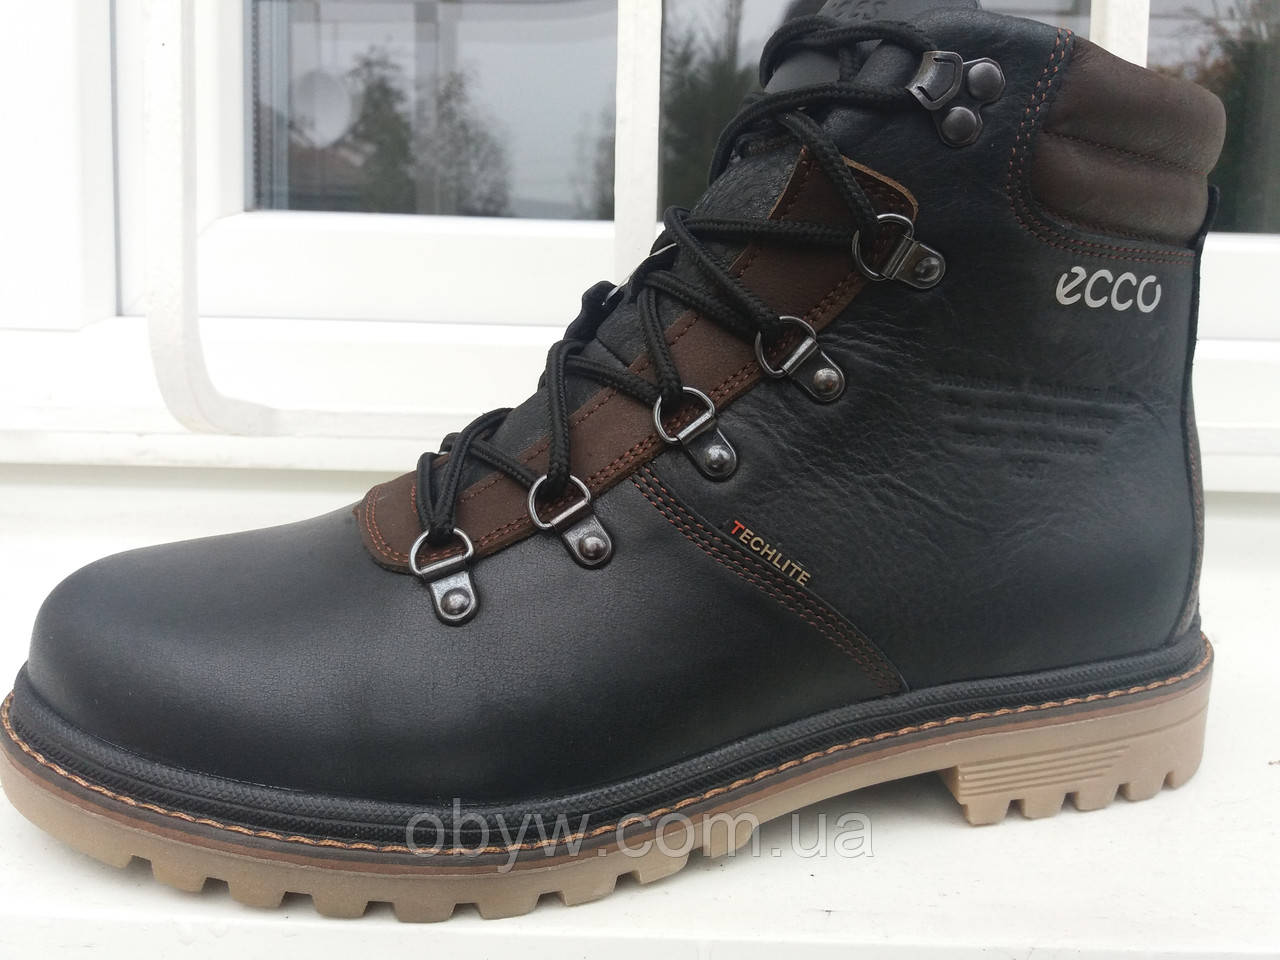 Зимняя обувь Ecco, цена 1 390 грн., купить в Днепре — Prom.ua (ID ... 560927419bb